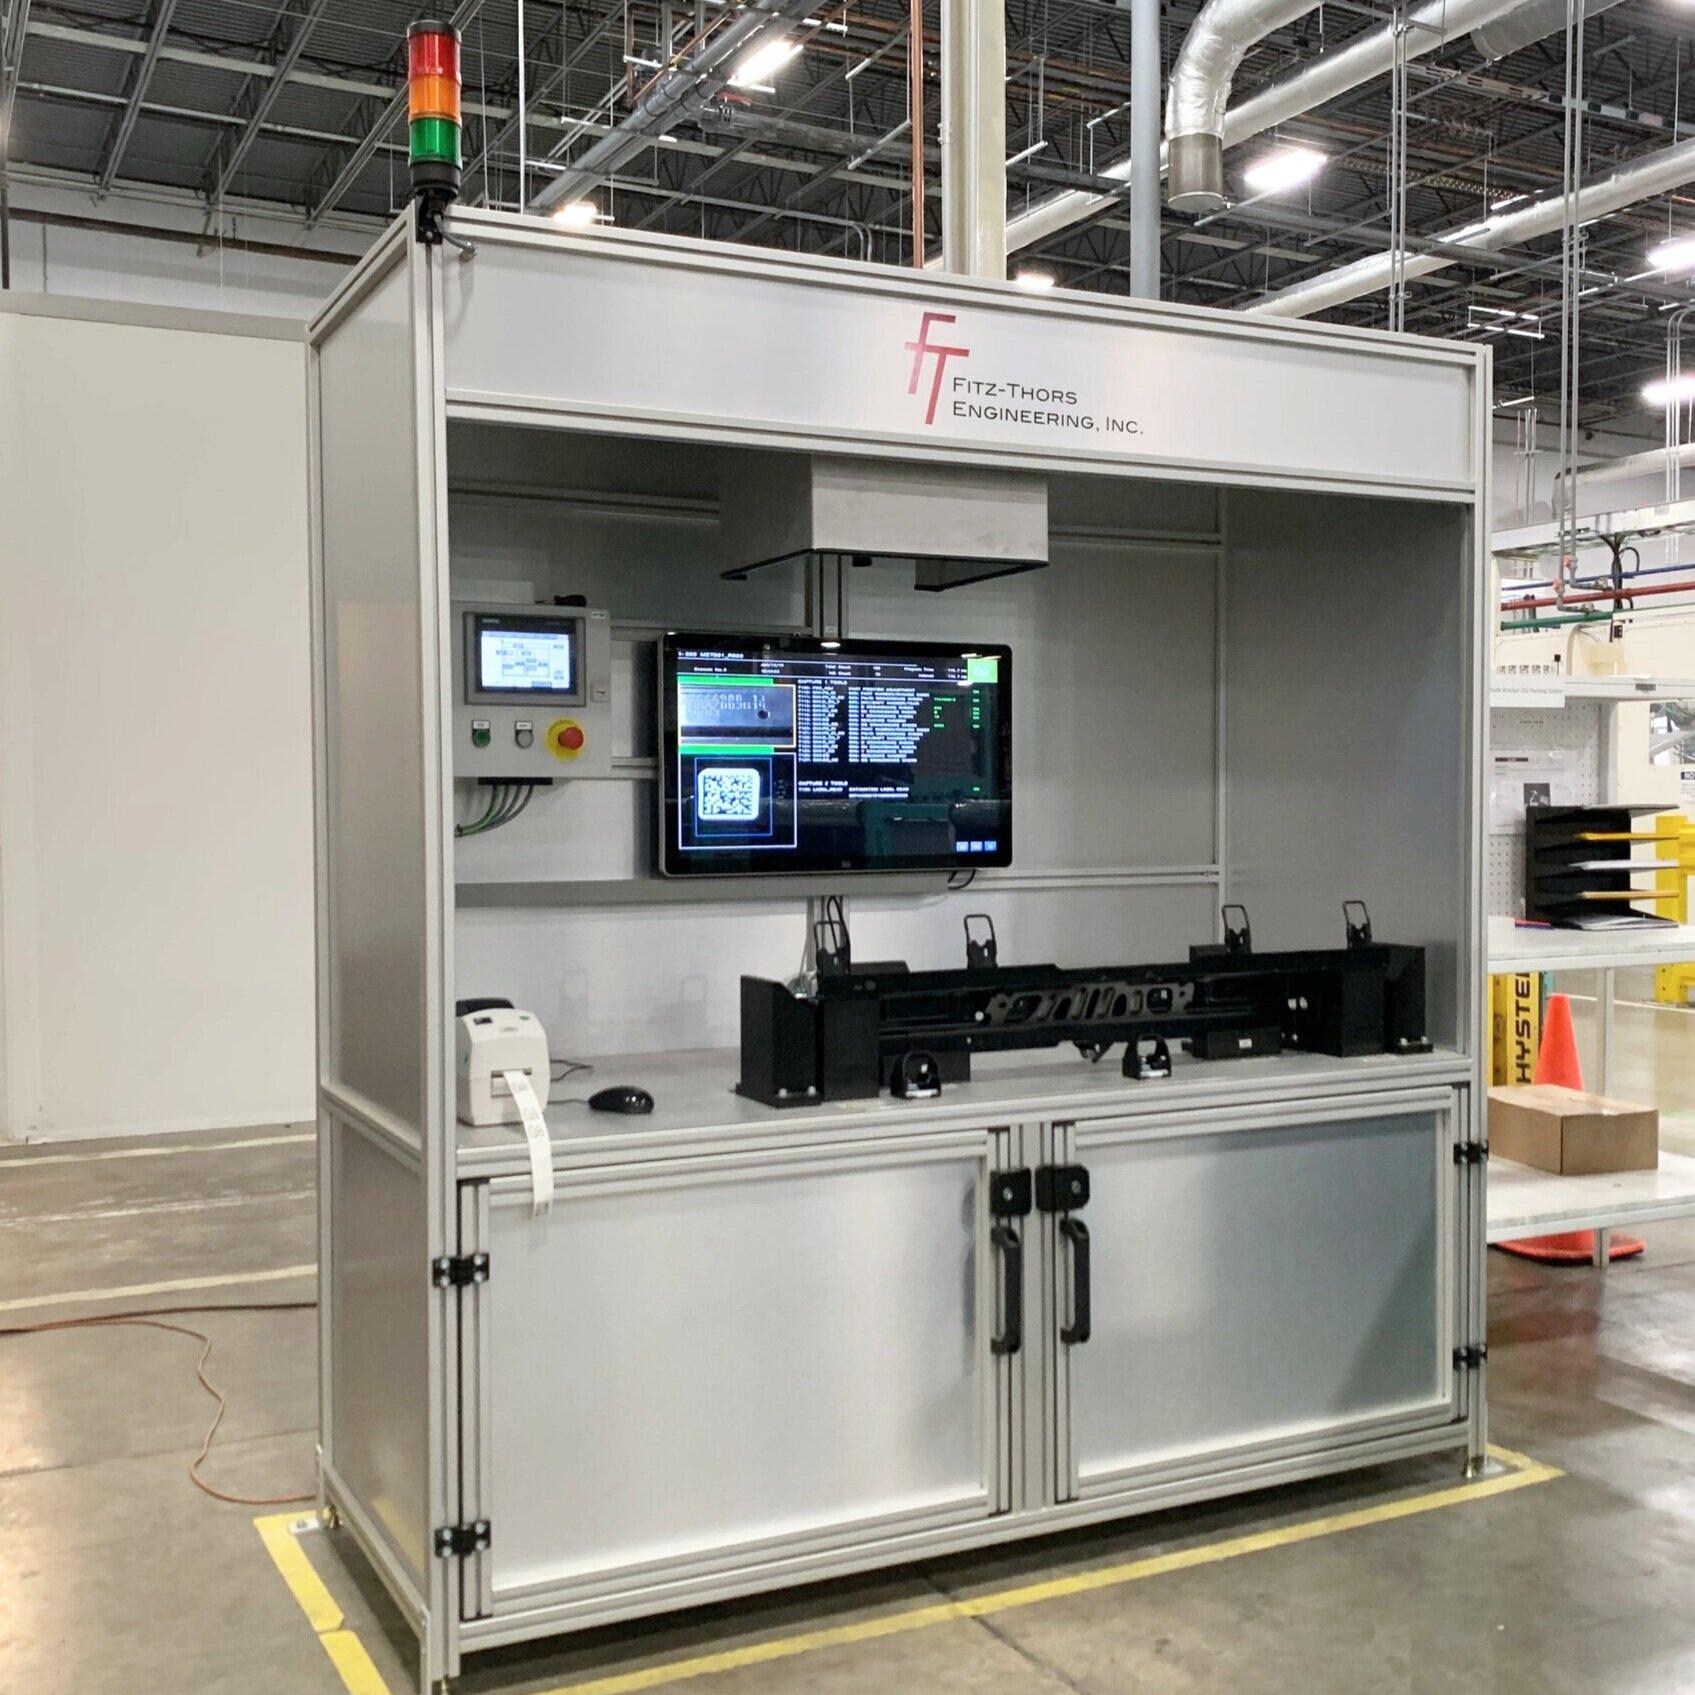 Process-Automation_vision-inspection-system_Fitz-Thors-Engineering_Birmingham-Alabama.jpeg